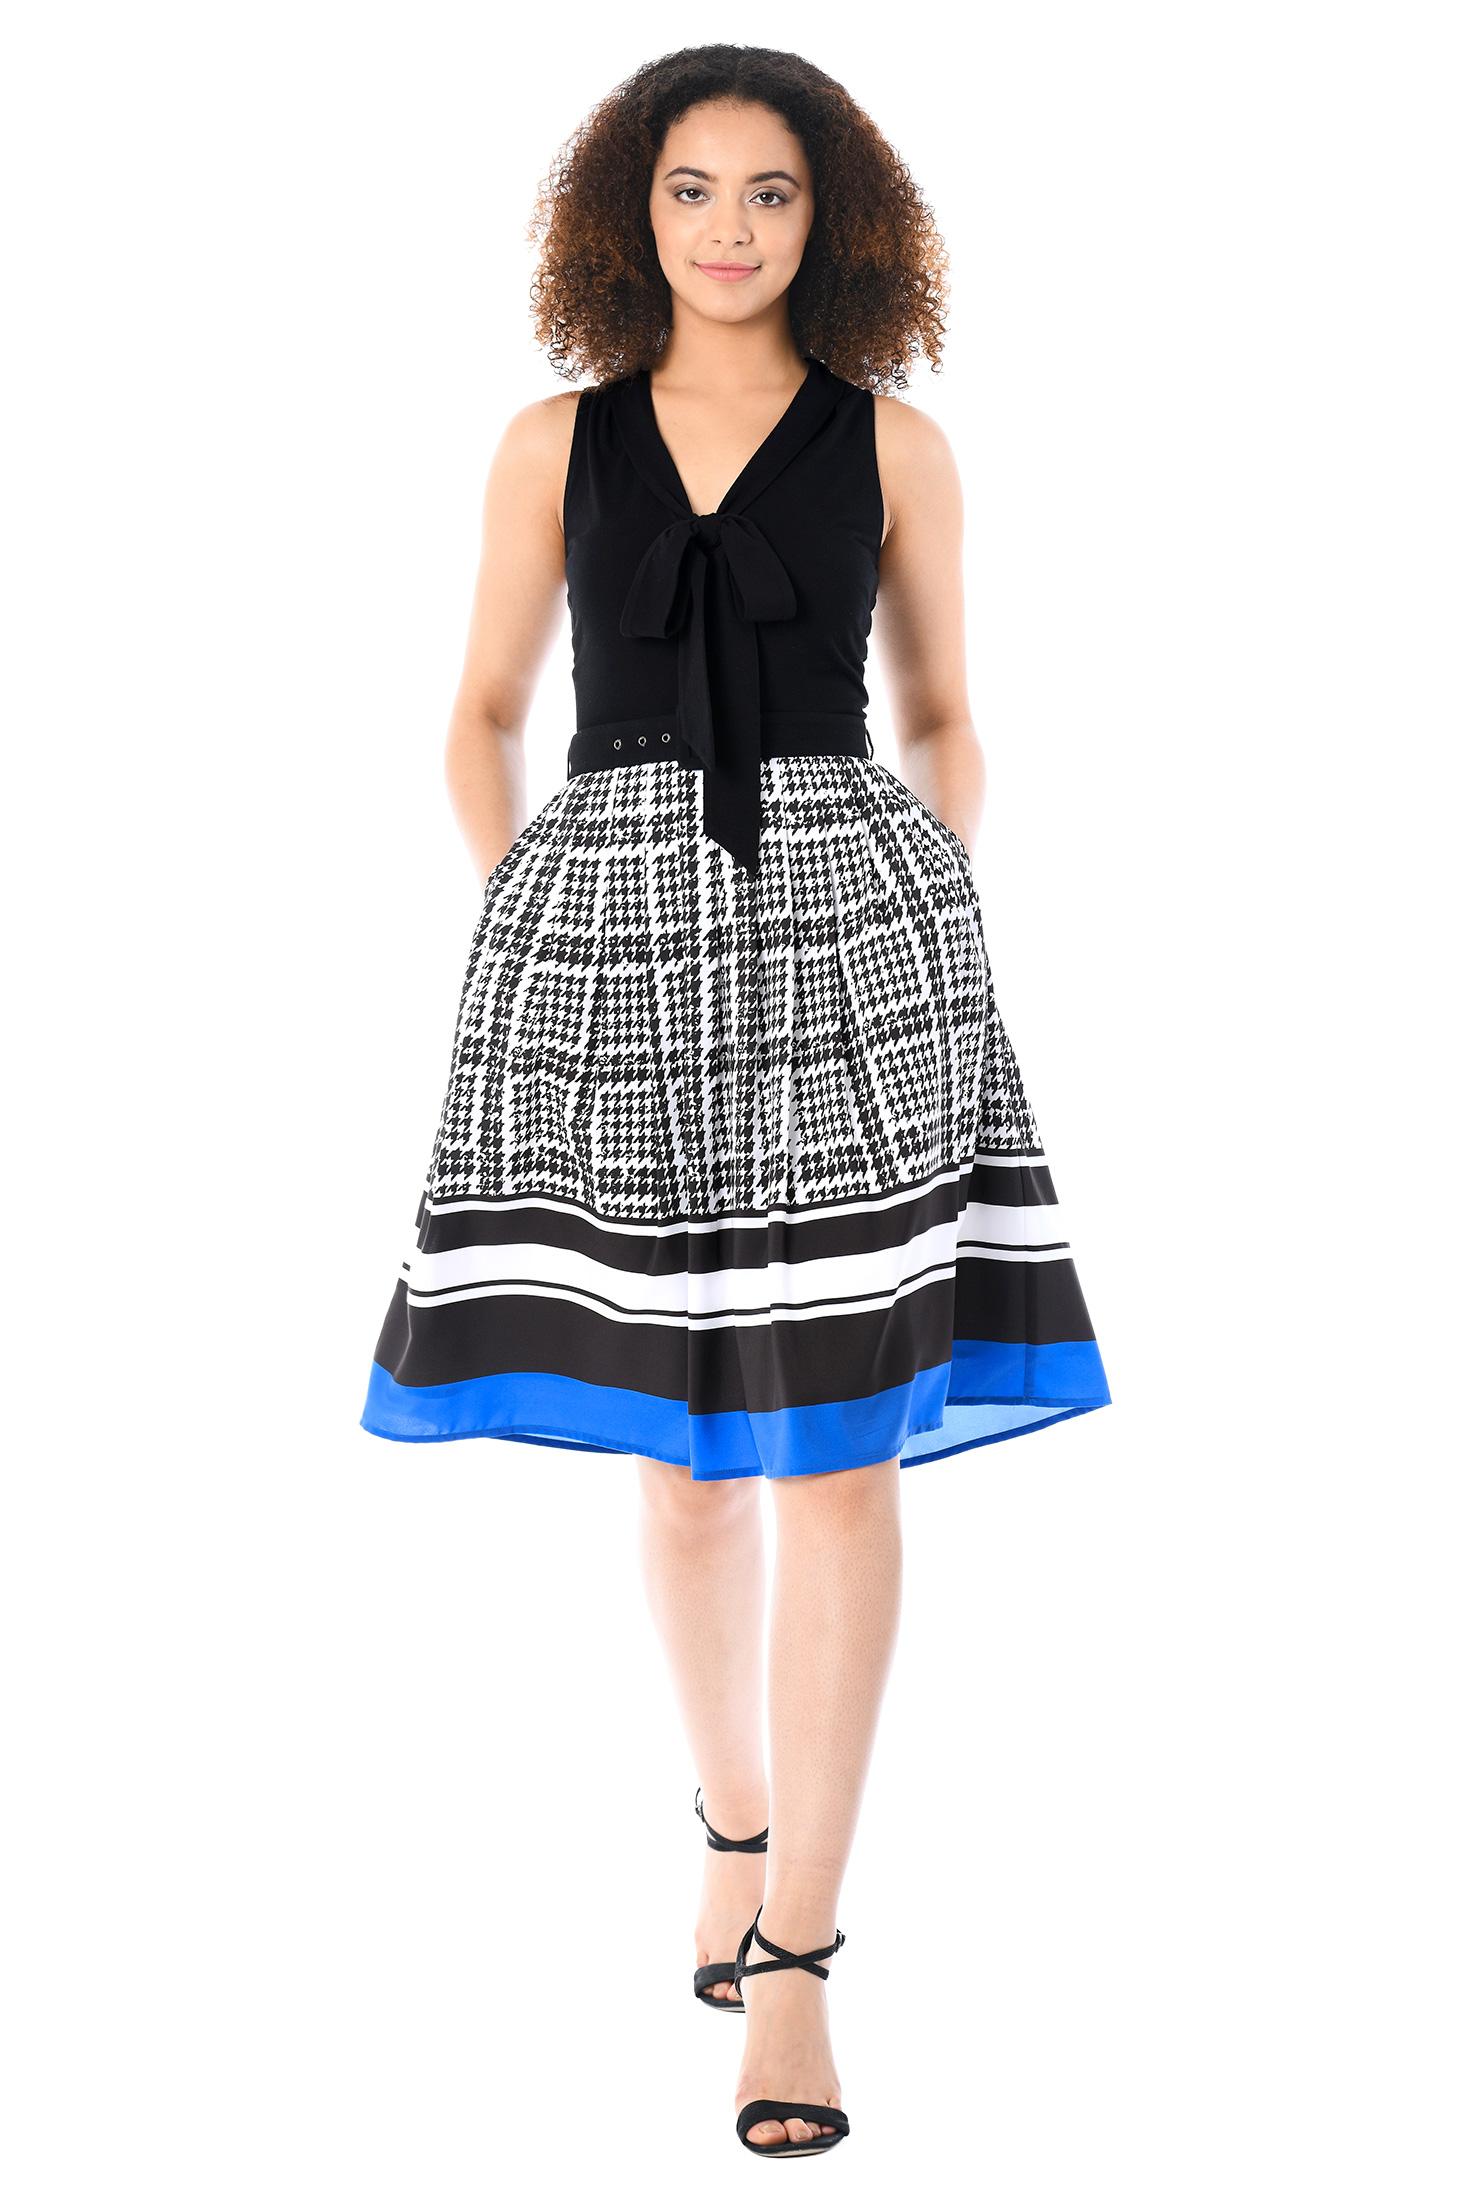 eShakti Women's Tie-neck mixed media dress CL0056964